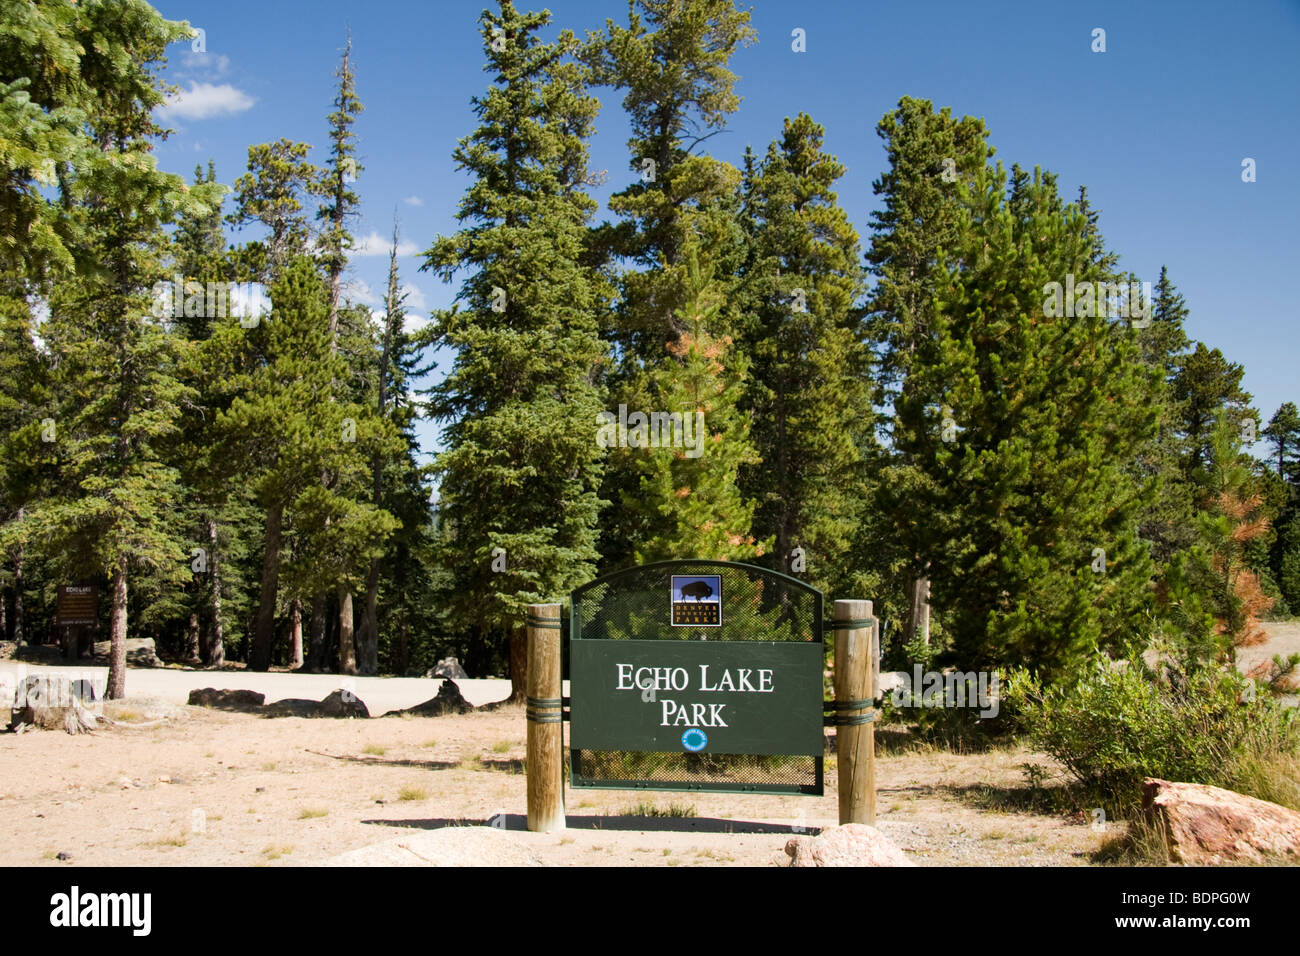 Echo Lake Park signpost, Colorado, USA - Stock Image